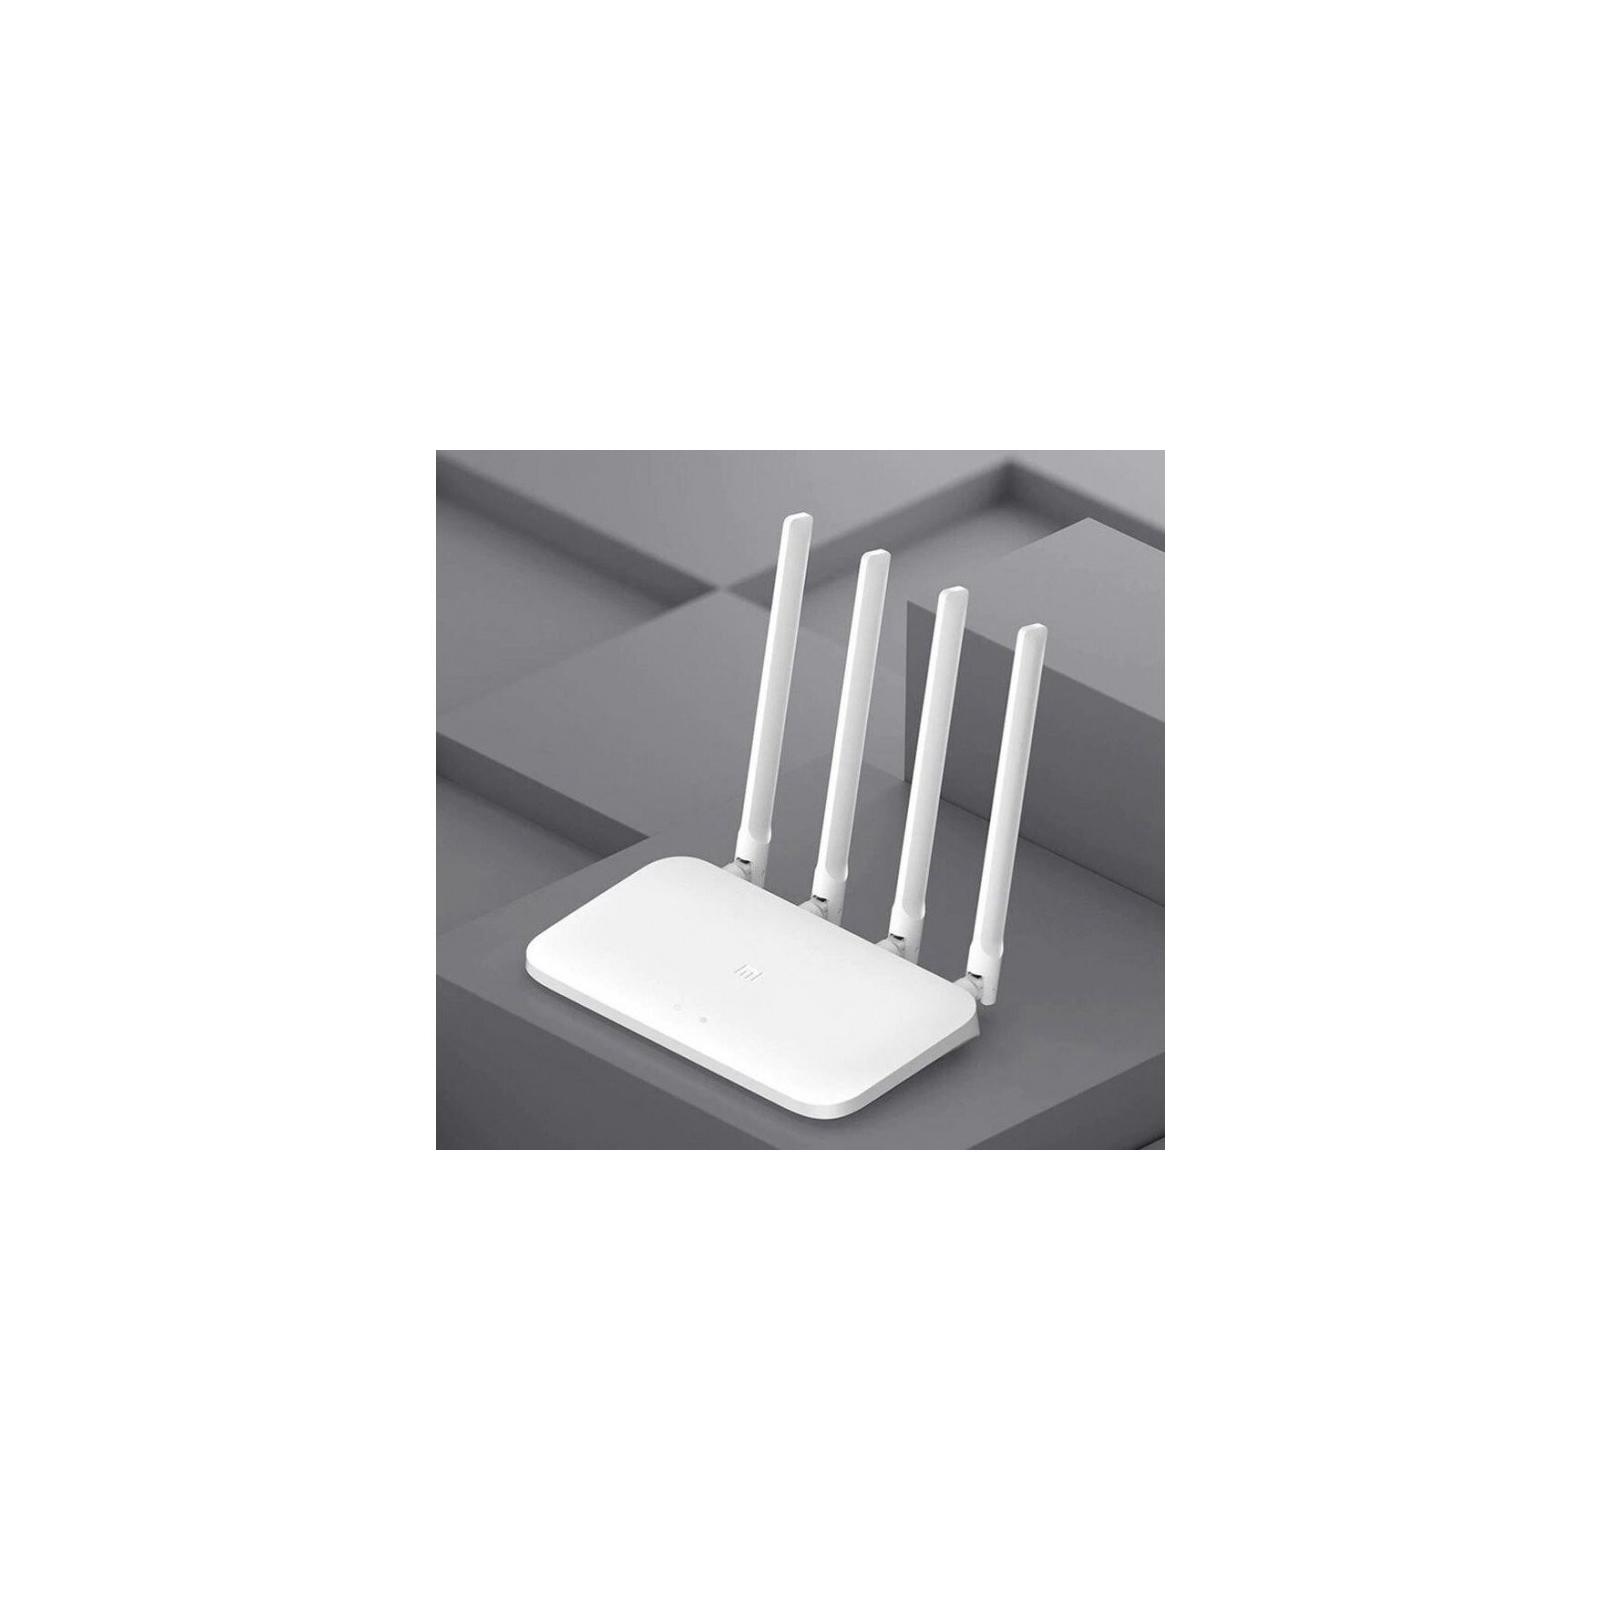 Маршрутизатор Xiaomi Mi Router 4A Giga Global зображення 7